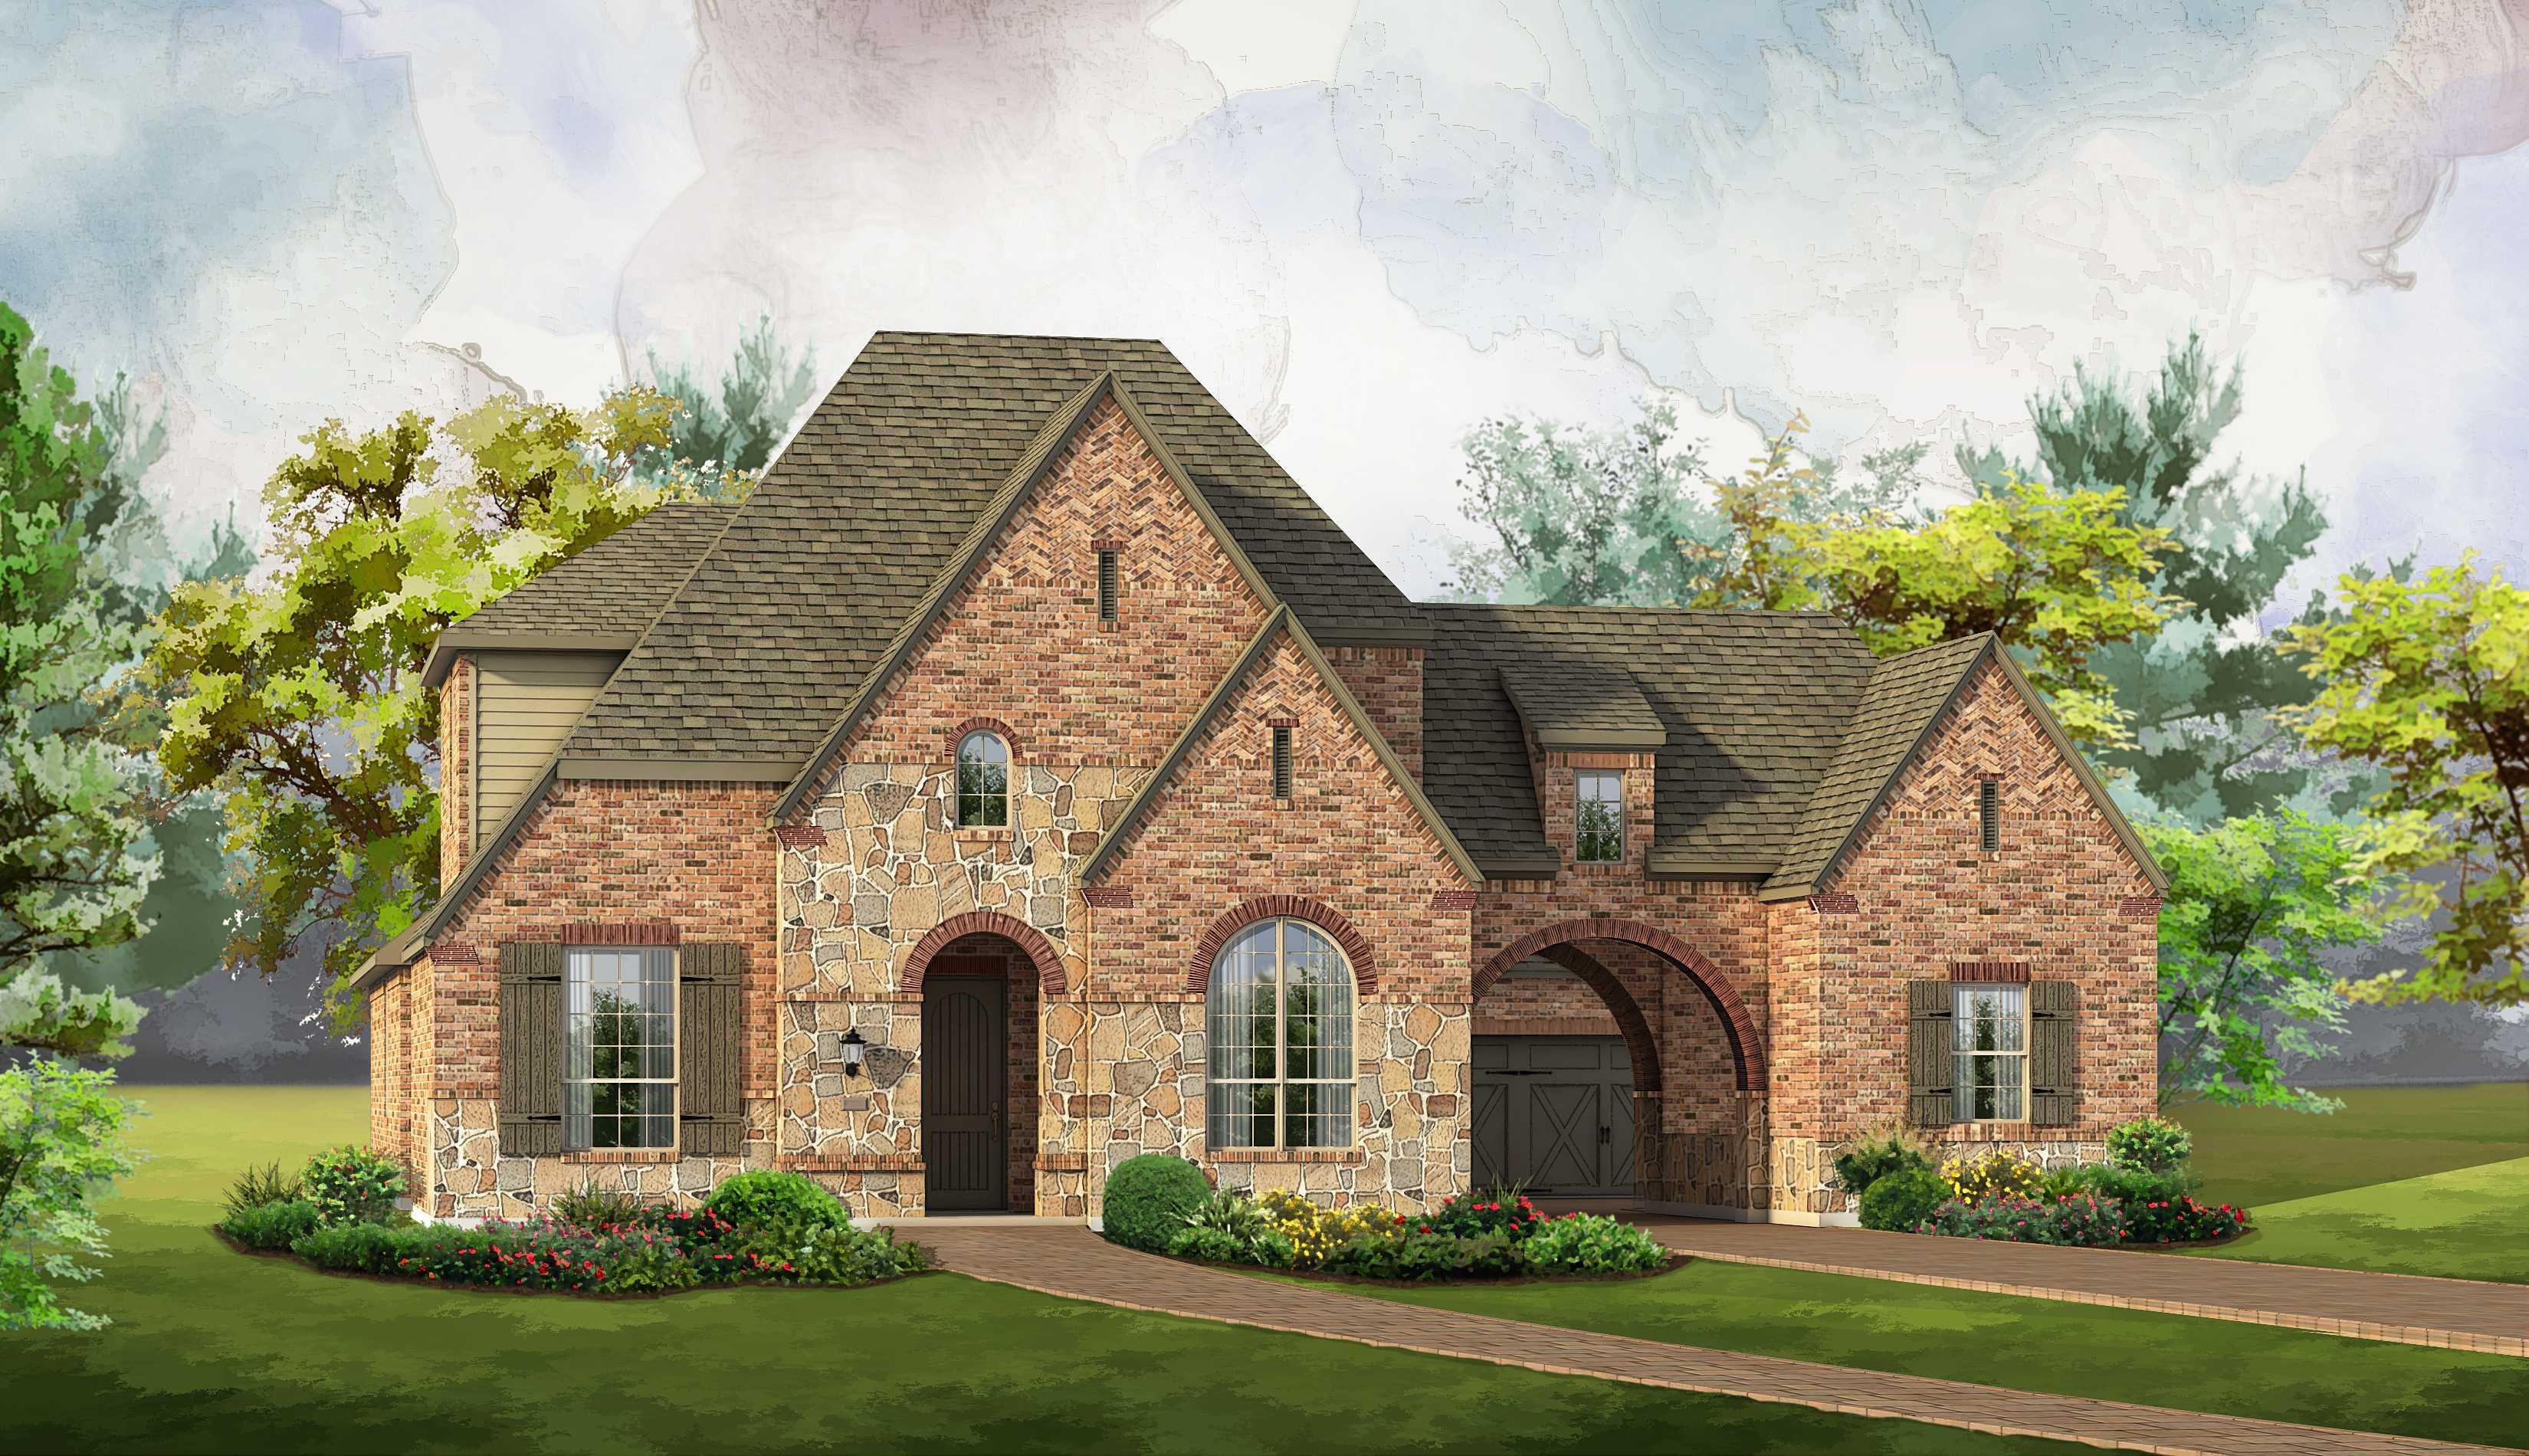 Single Family for Sale at Regency Park - Plan 6161 4012 Baldomera Street Flower Mound, Texas 75022 United States